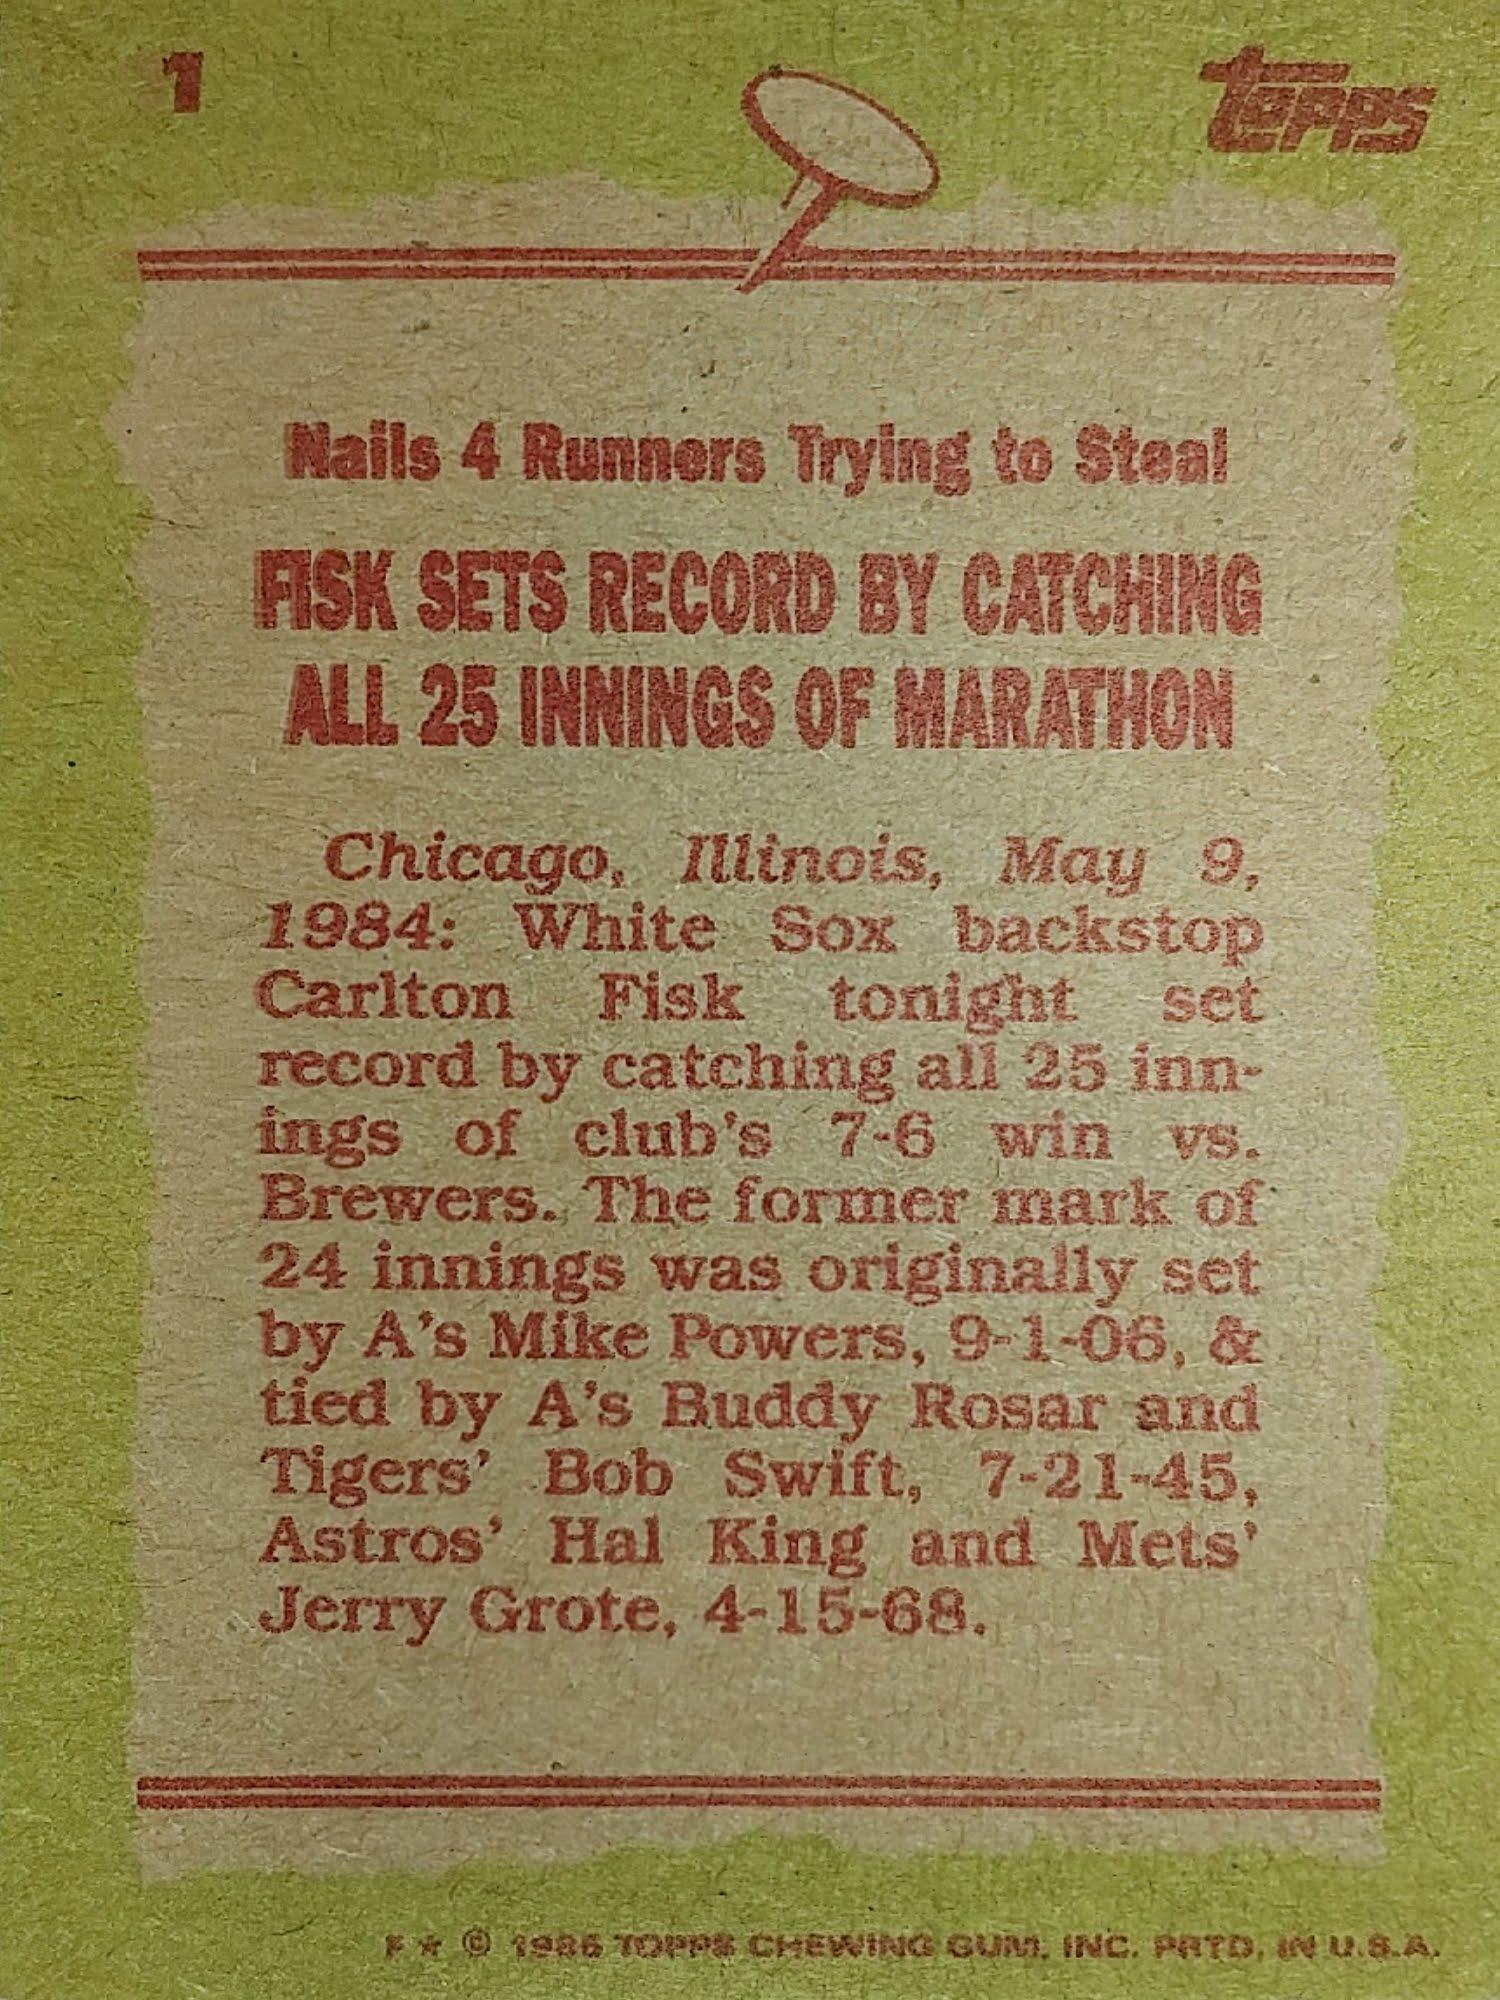 Topps 1985 Record Breaker Back